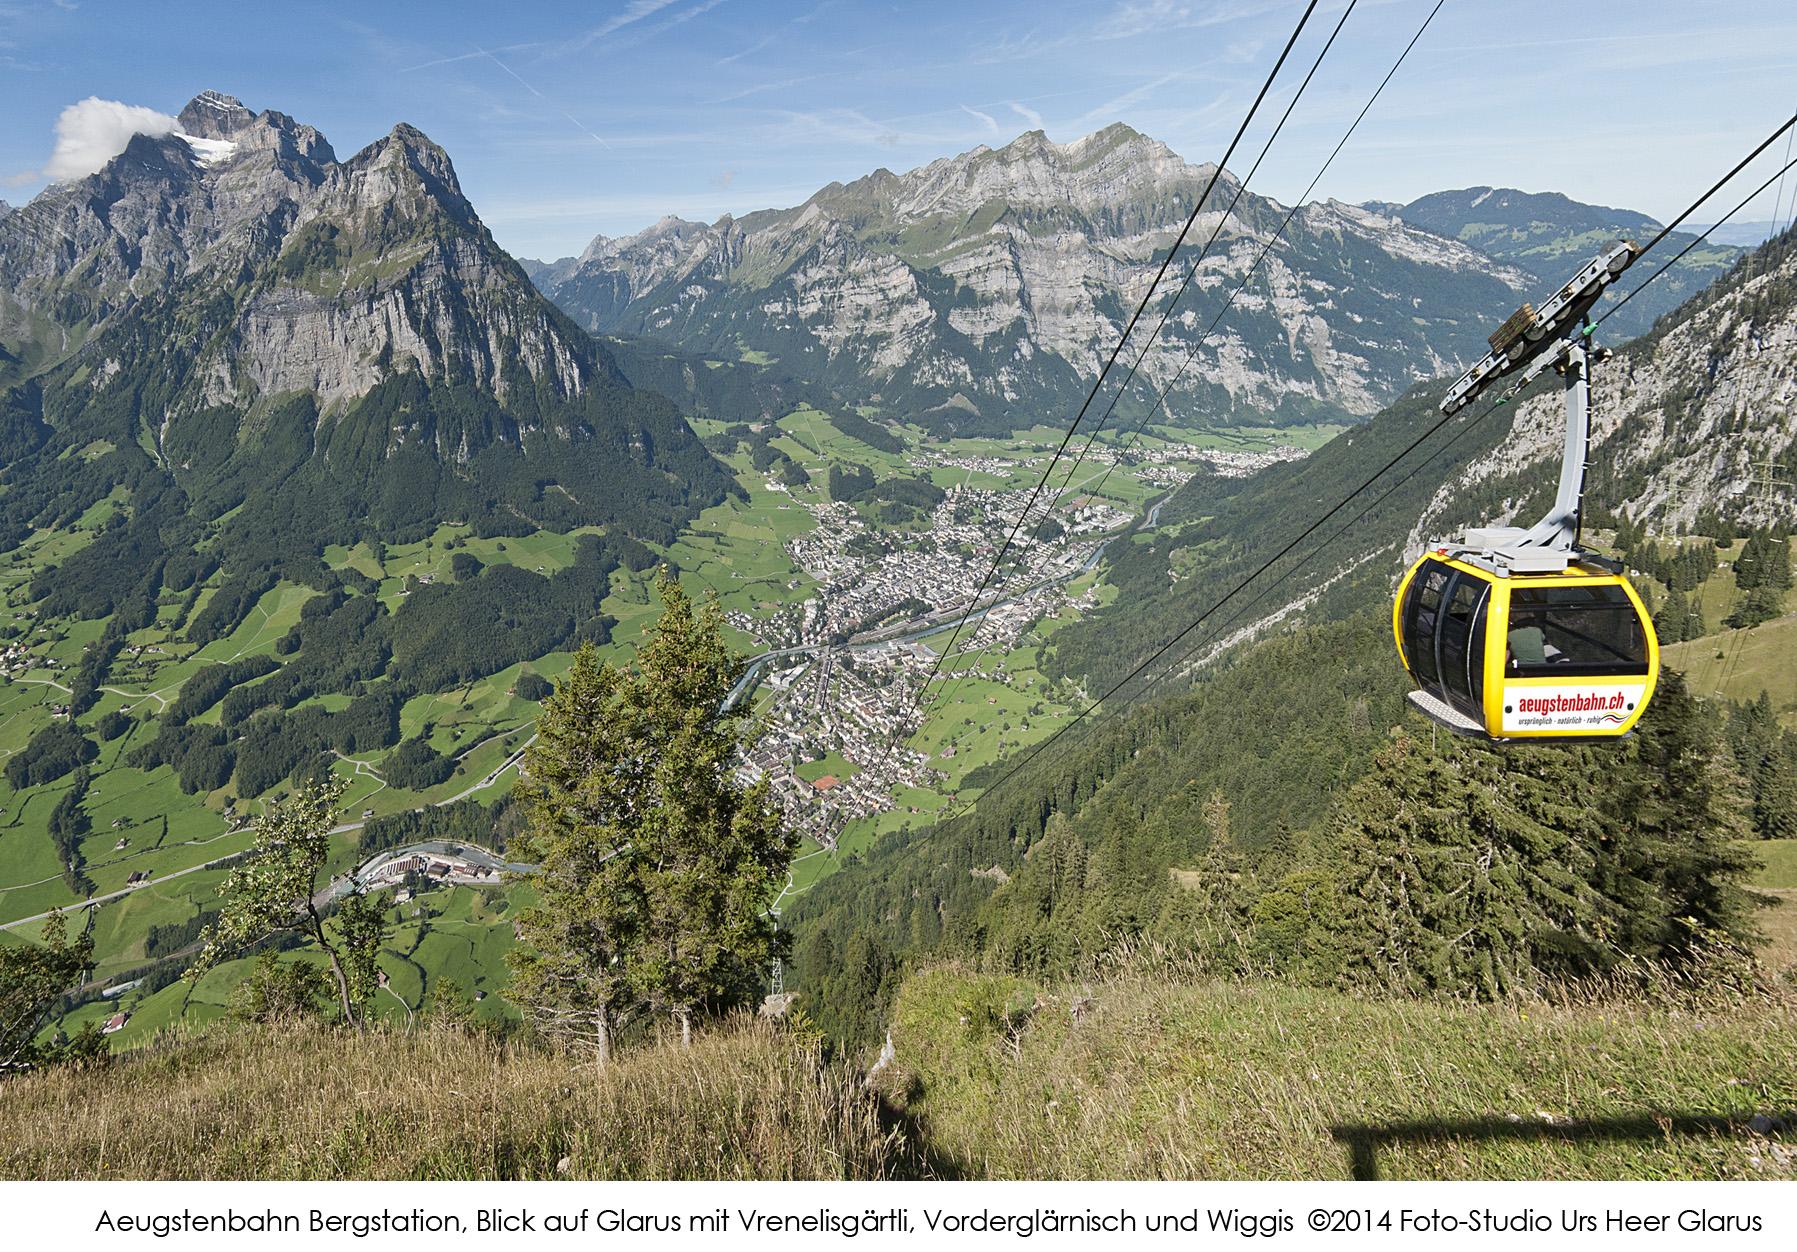 CFoto-Studio Urs Heer Glarus-Aeugstenbahn Panorama Glarus